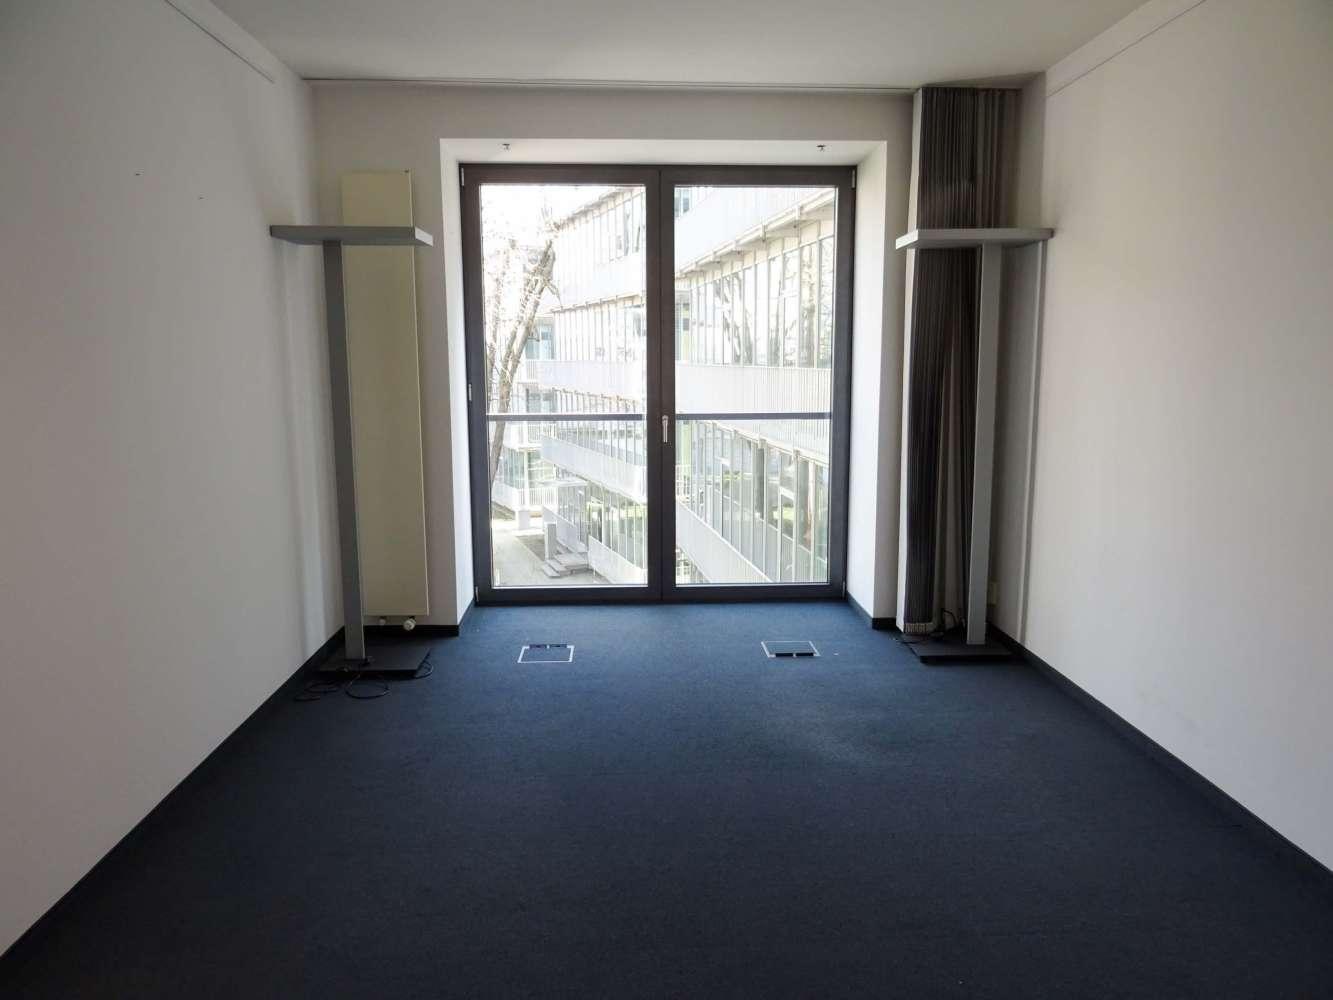 Büros Frankfurt am main, 60325 - Büro - Frankfurt am Main, Westend-Süd - F0148 - 10446361